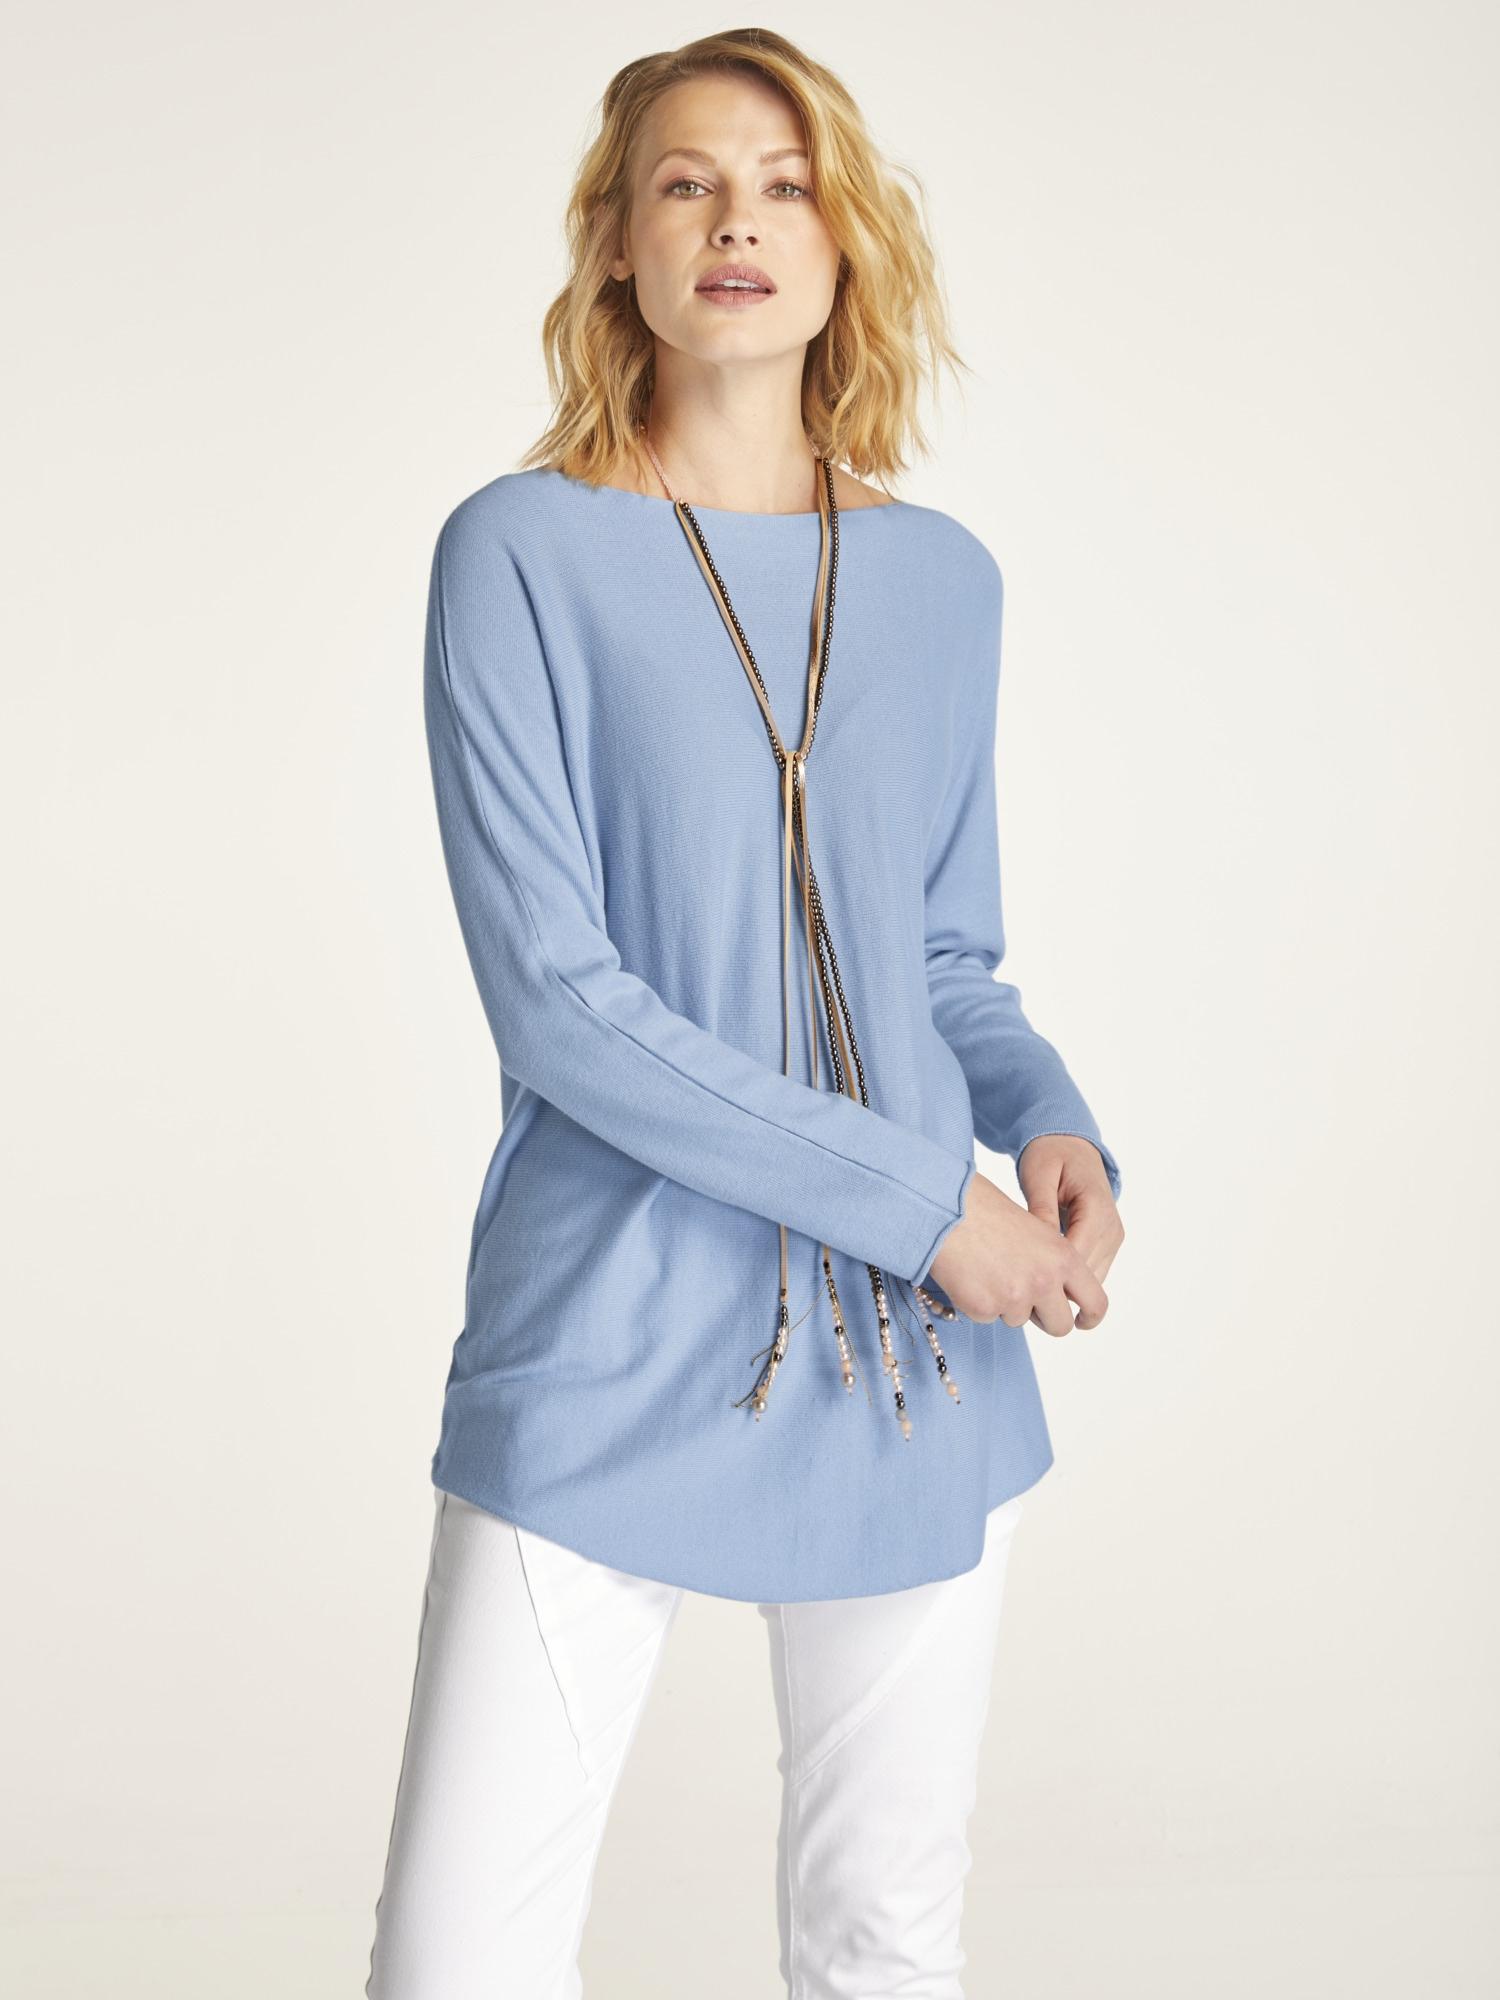 heine CASUAL Longpullover | Bekleidung > Pullover > Longpullover | Blau | Baumwolle | Heine Casual